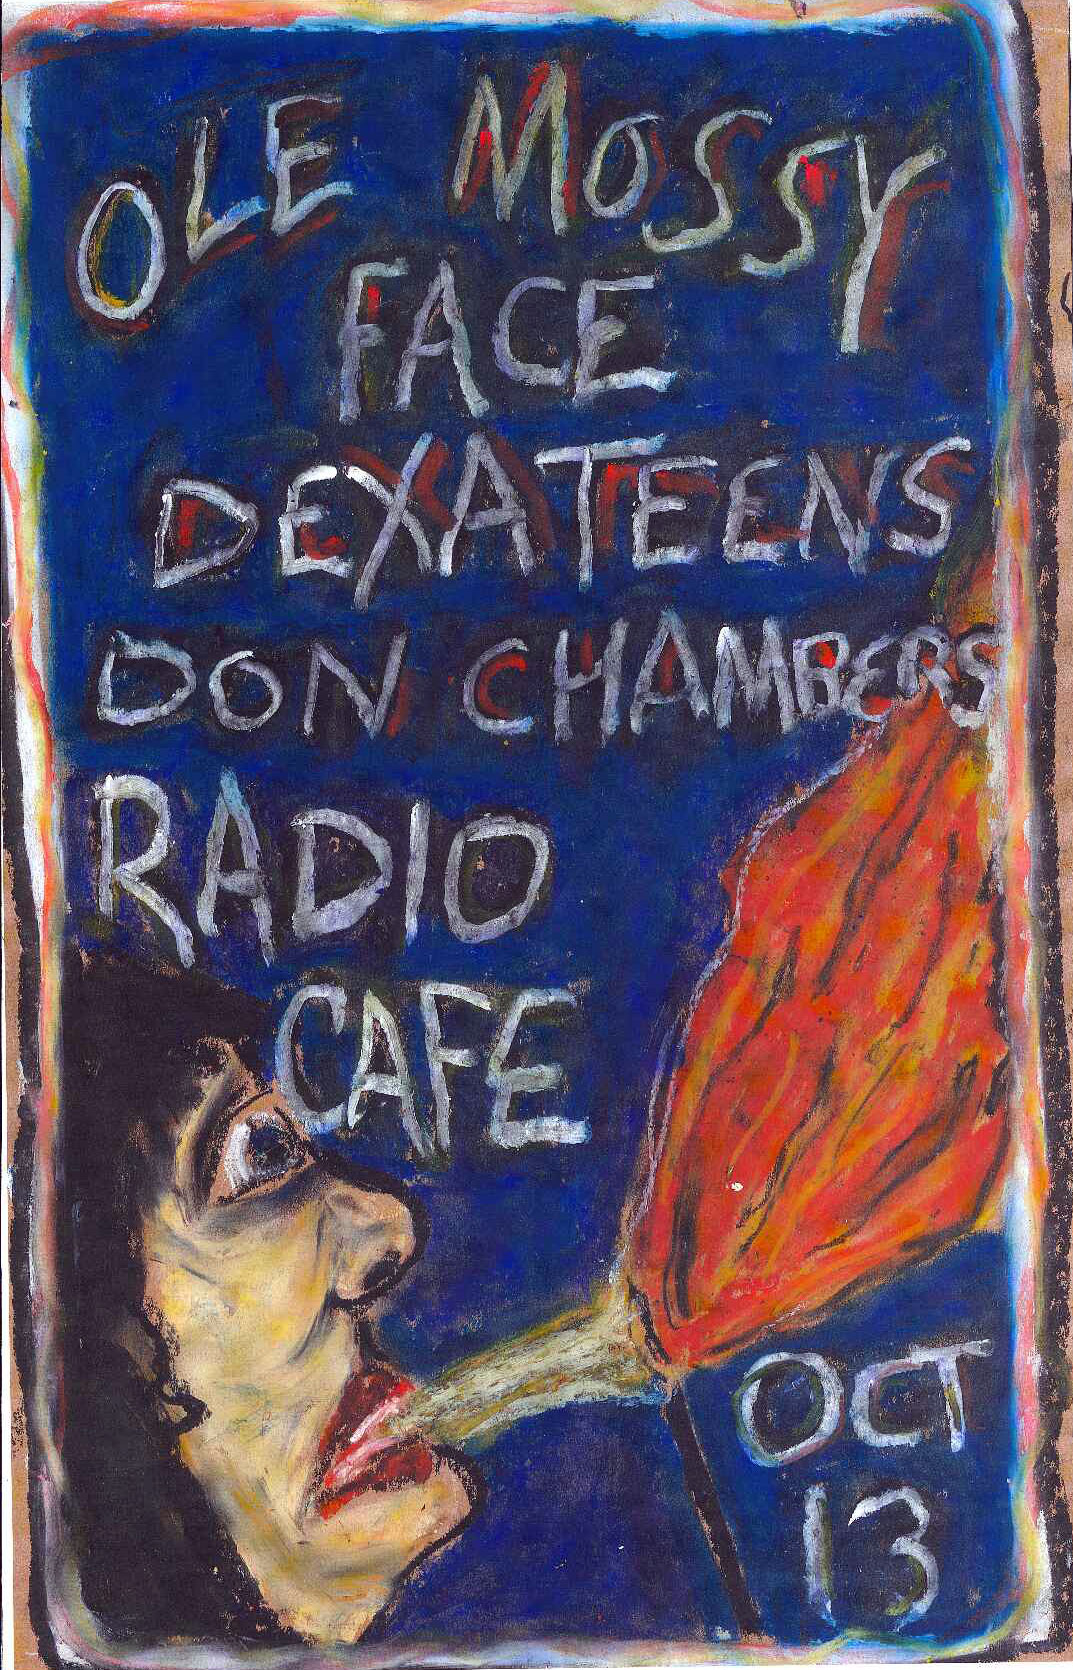 OMF w/Dexateens & Don Chambers